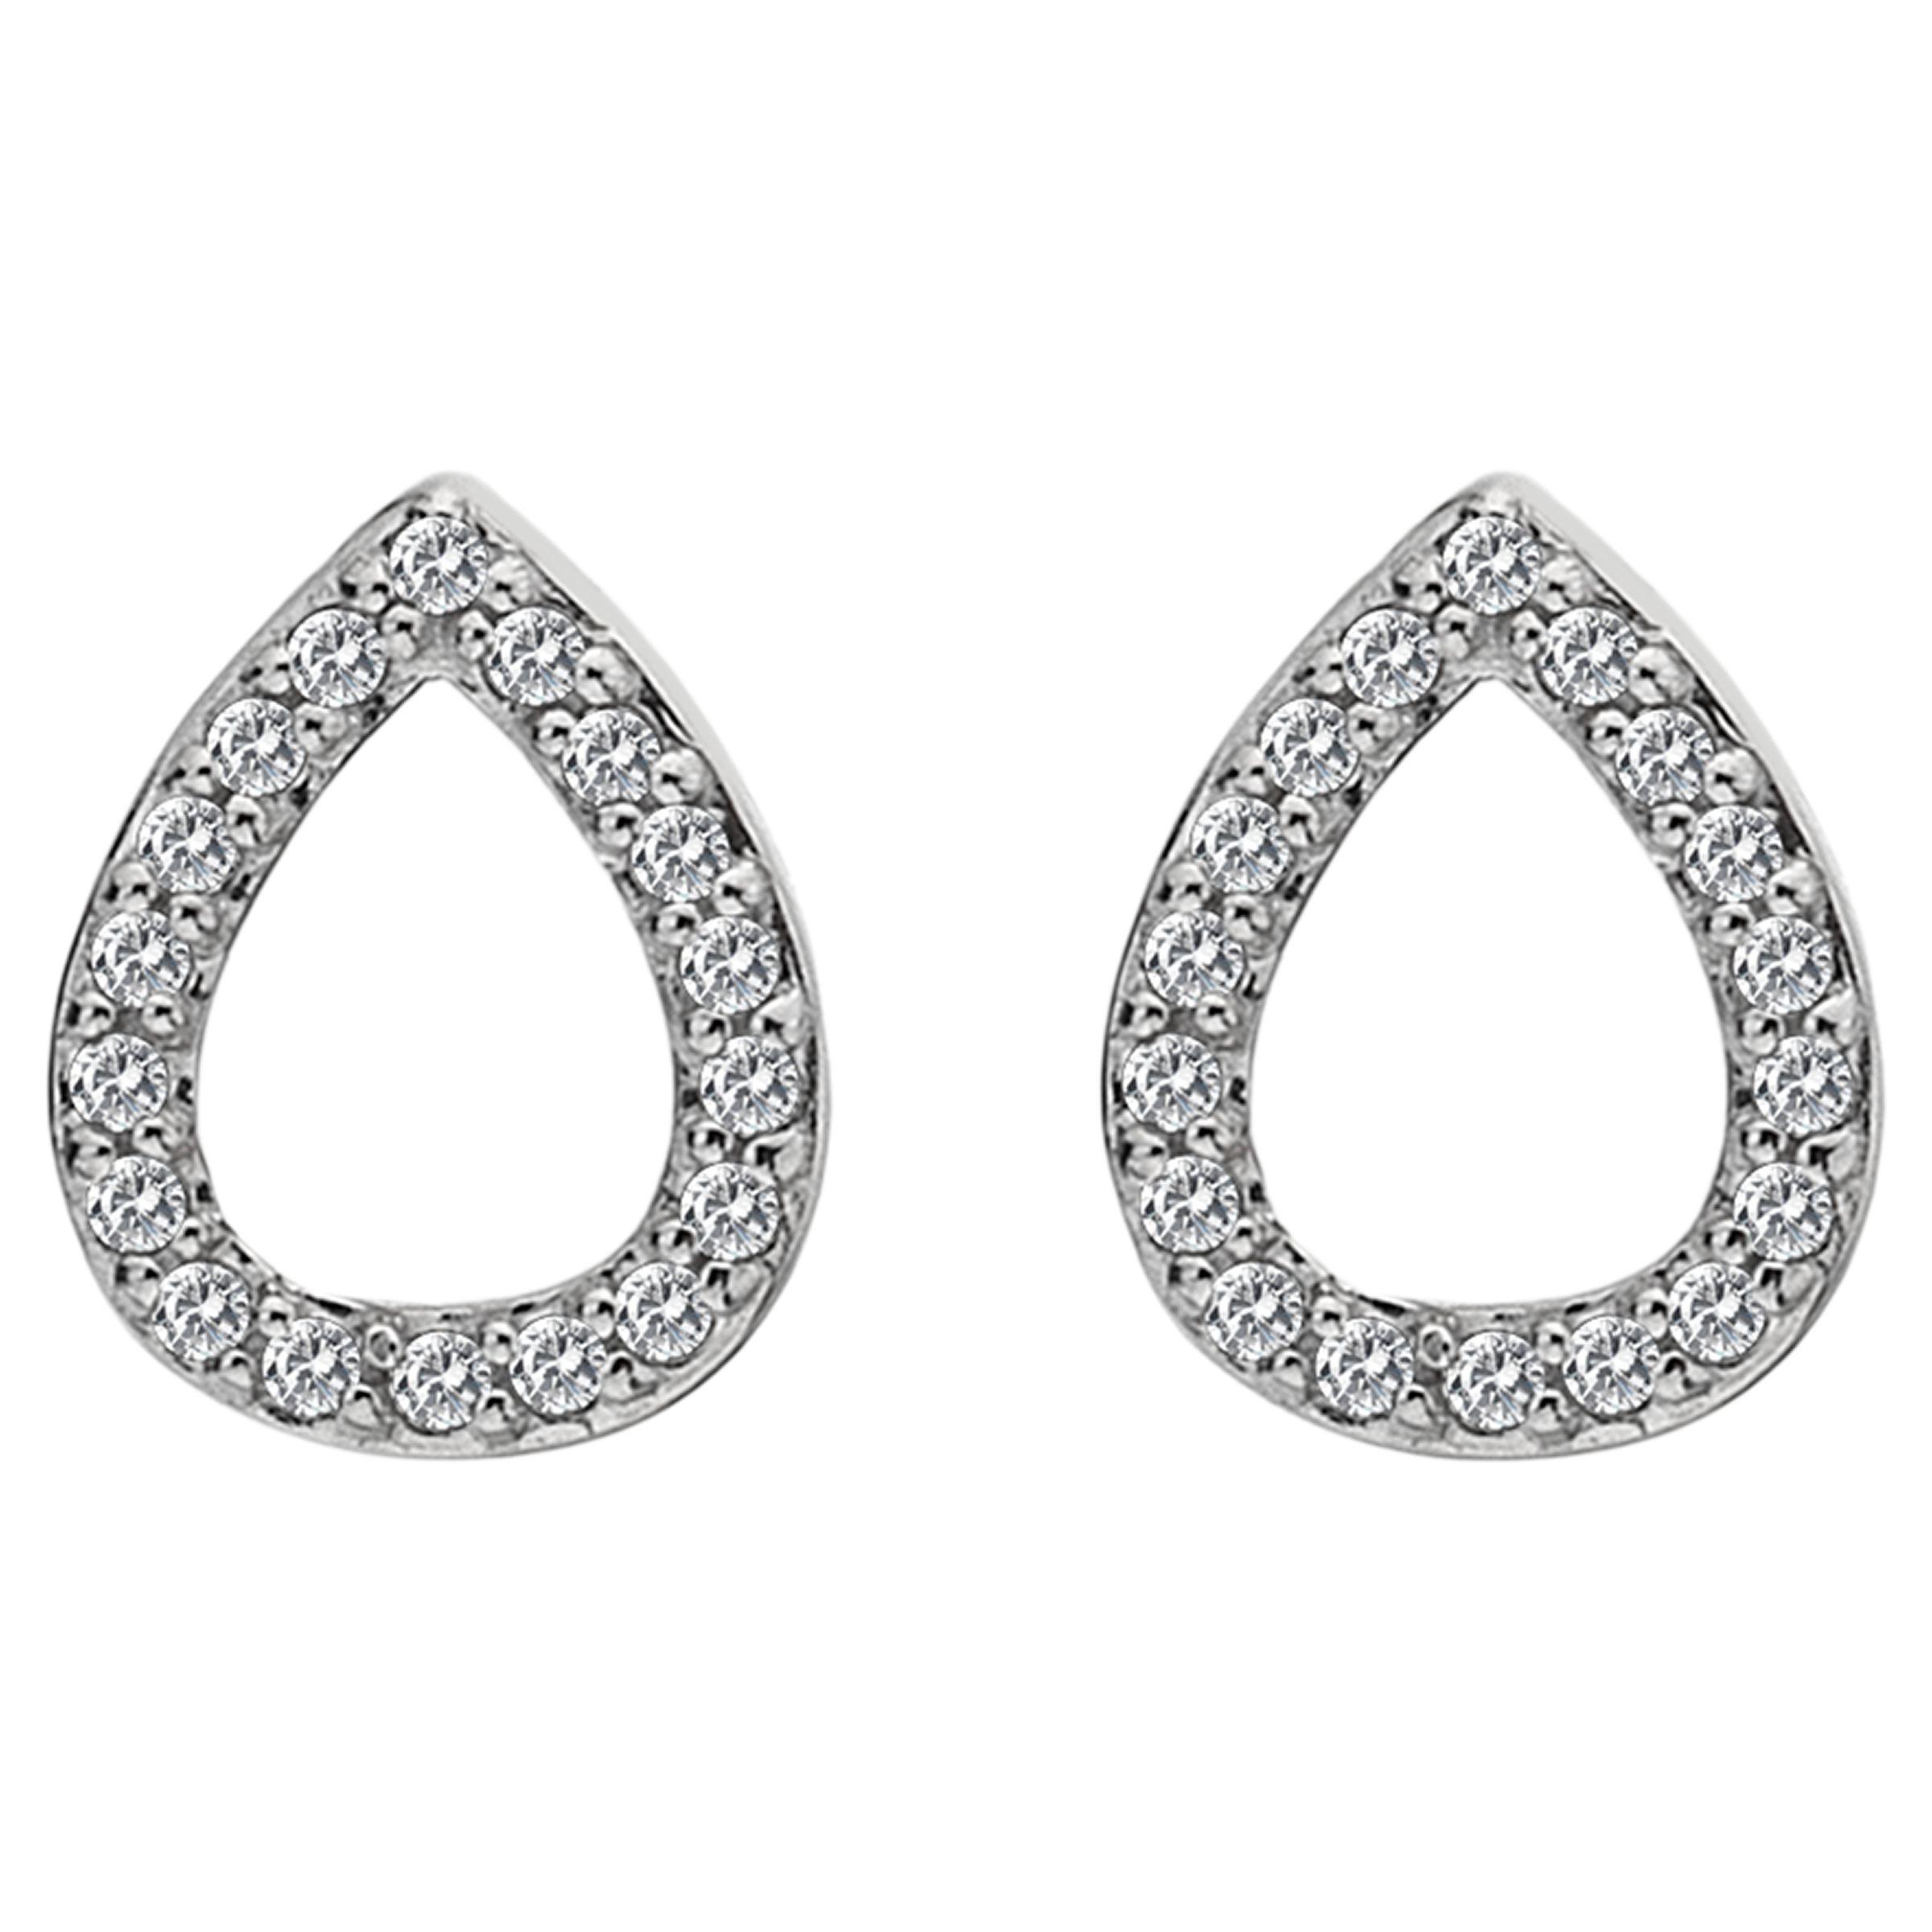 Hot Diamonds Hot Diamonds White Topaz and Diamond Teardrop Stud Earrings, Silver